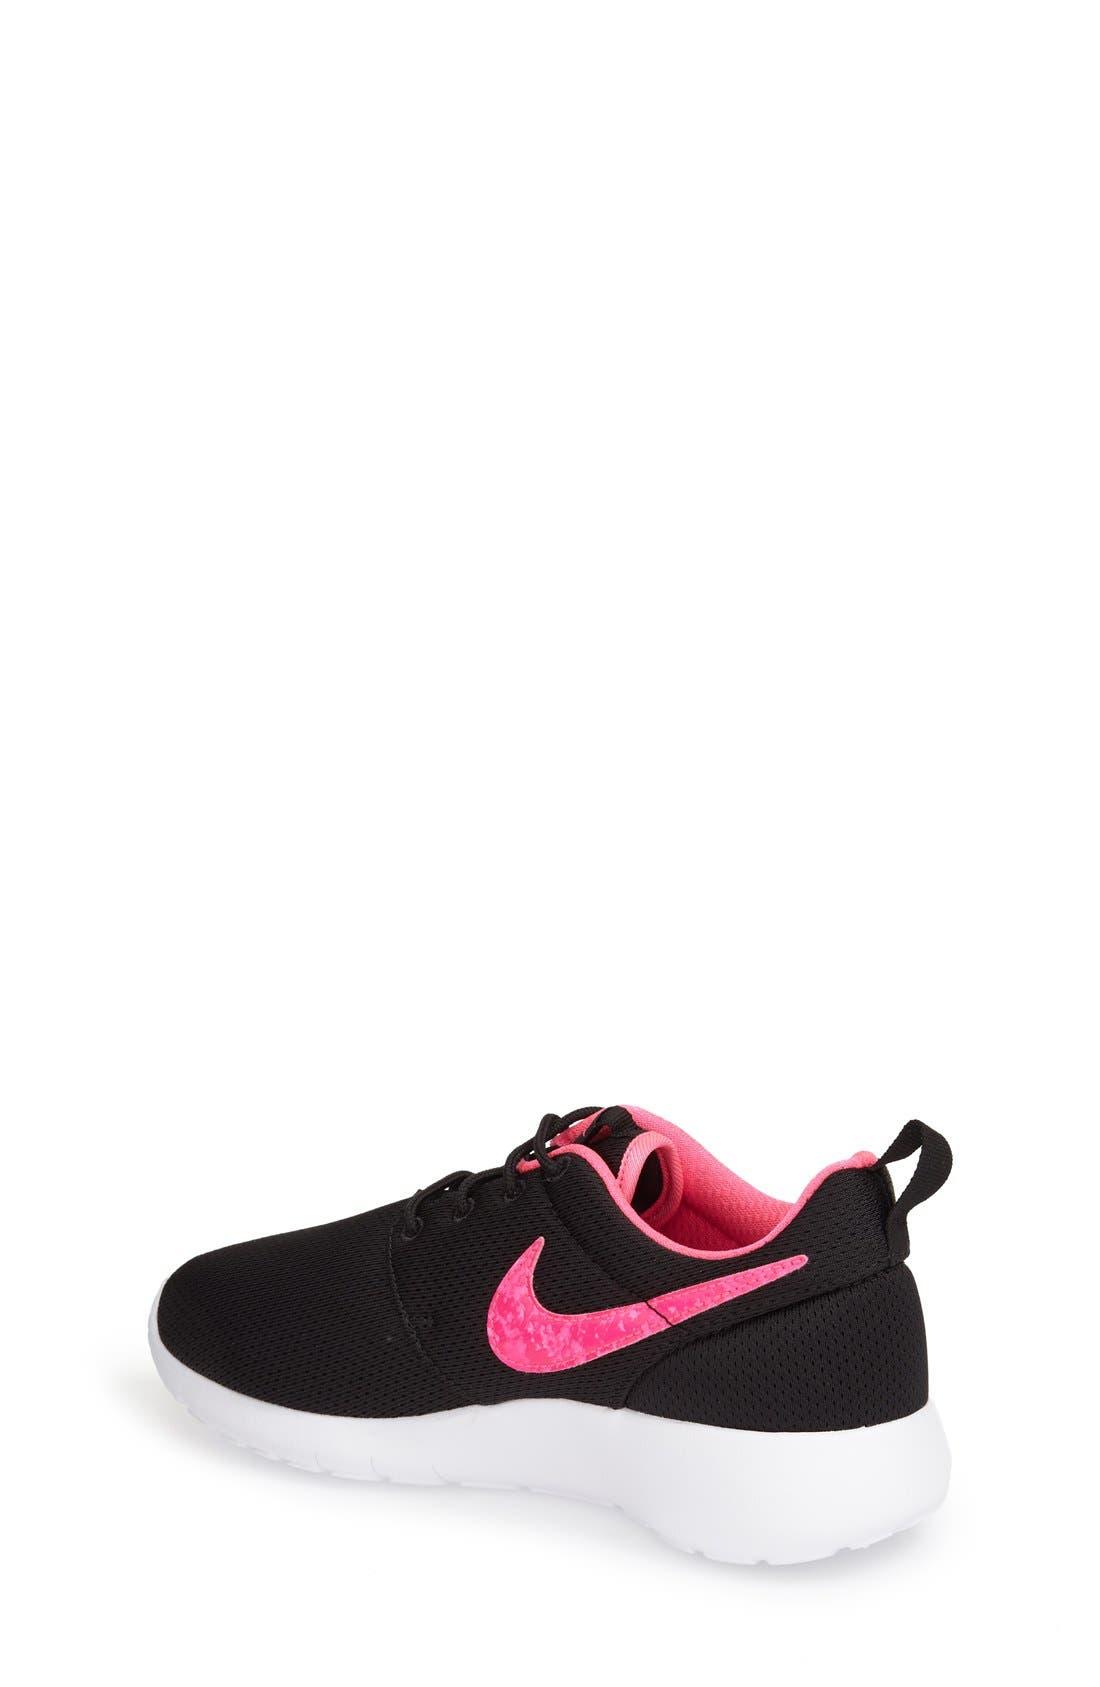 'Roshe Run' Athletic Shoe,                             Alternate thumbnail 77, color,